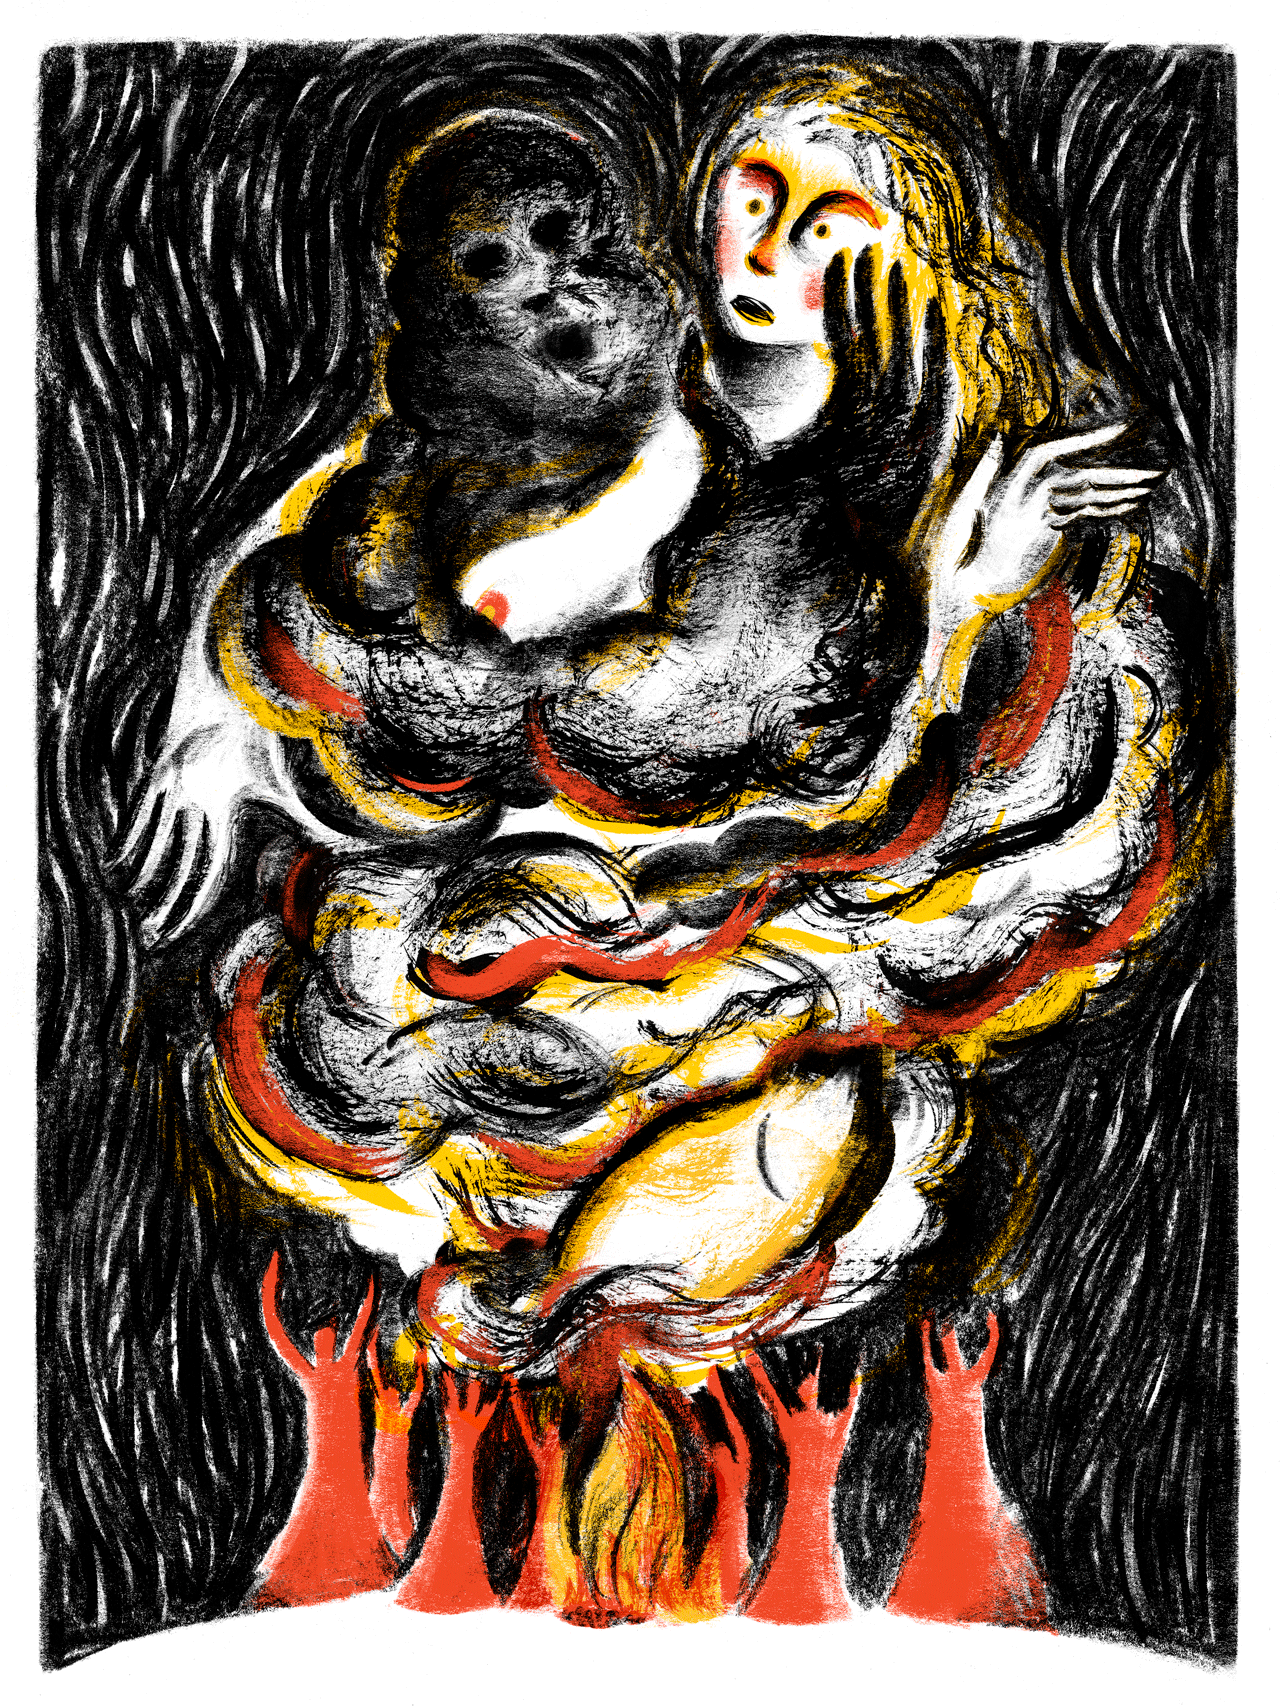 Light Grey Art Lab - Burn the Witch